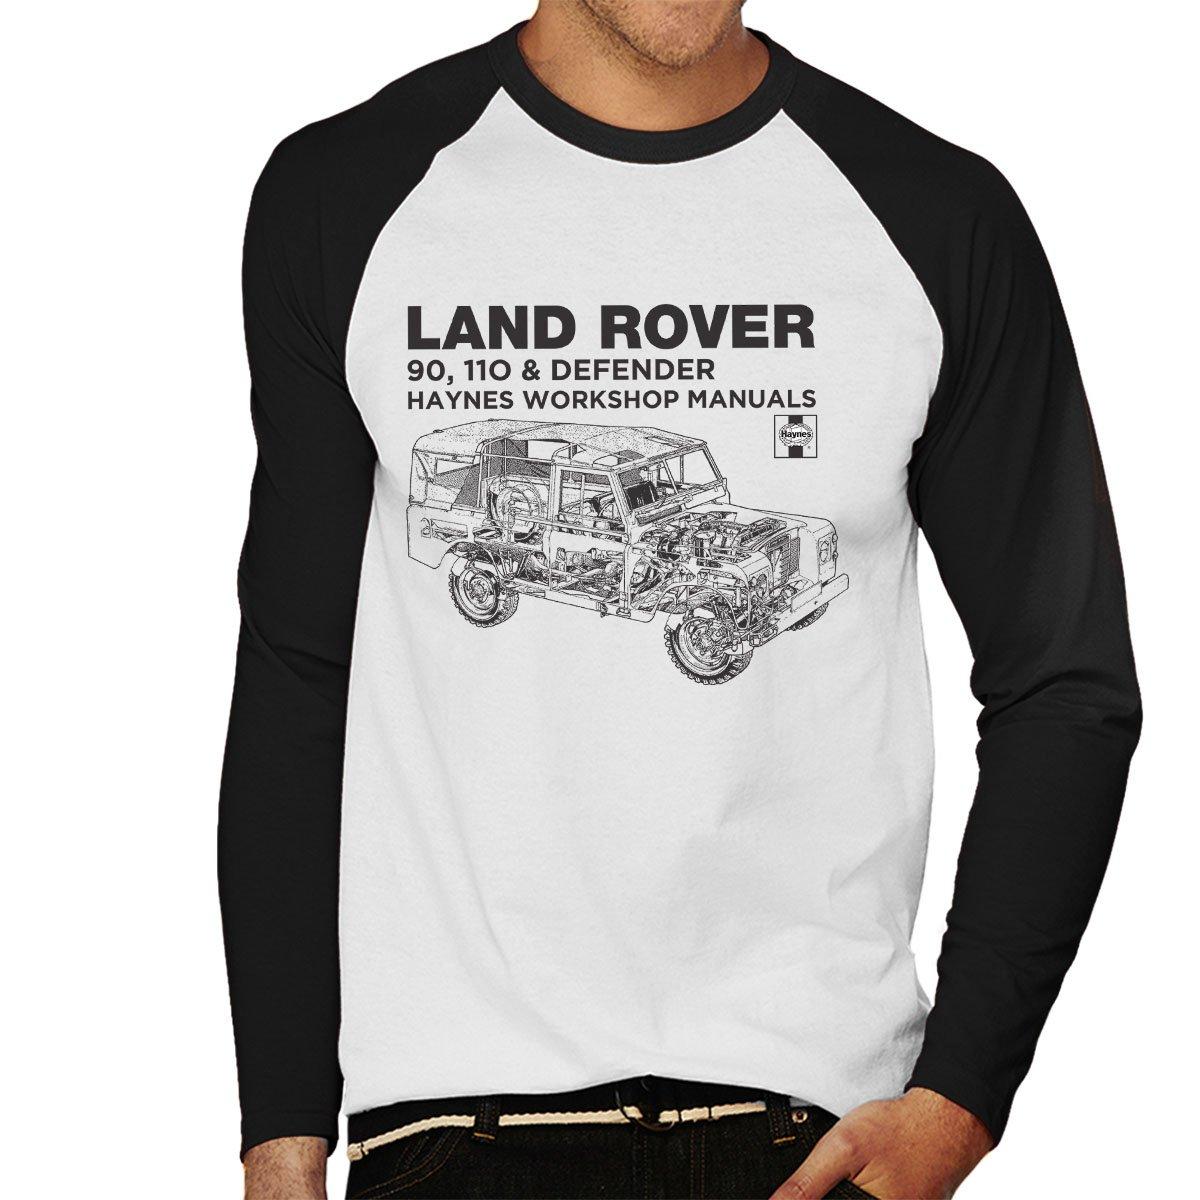 Haynes Owners Workshop Manual Land Rover Defender Black Men's Baseball Long  Sleeved T-Shirt: Amazon.co.uk: Clothing